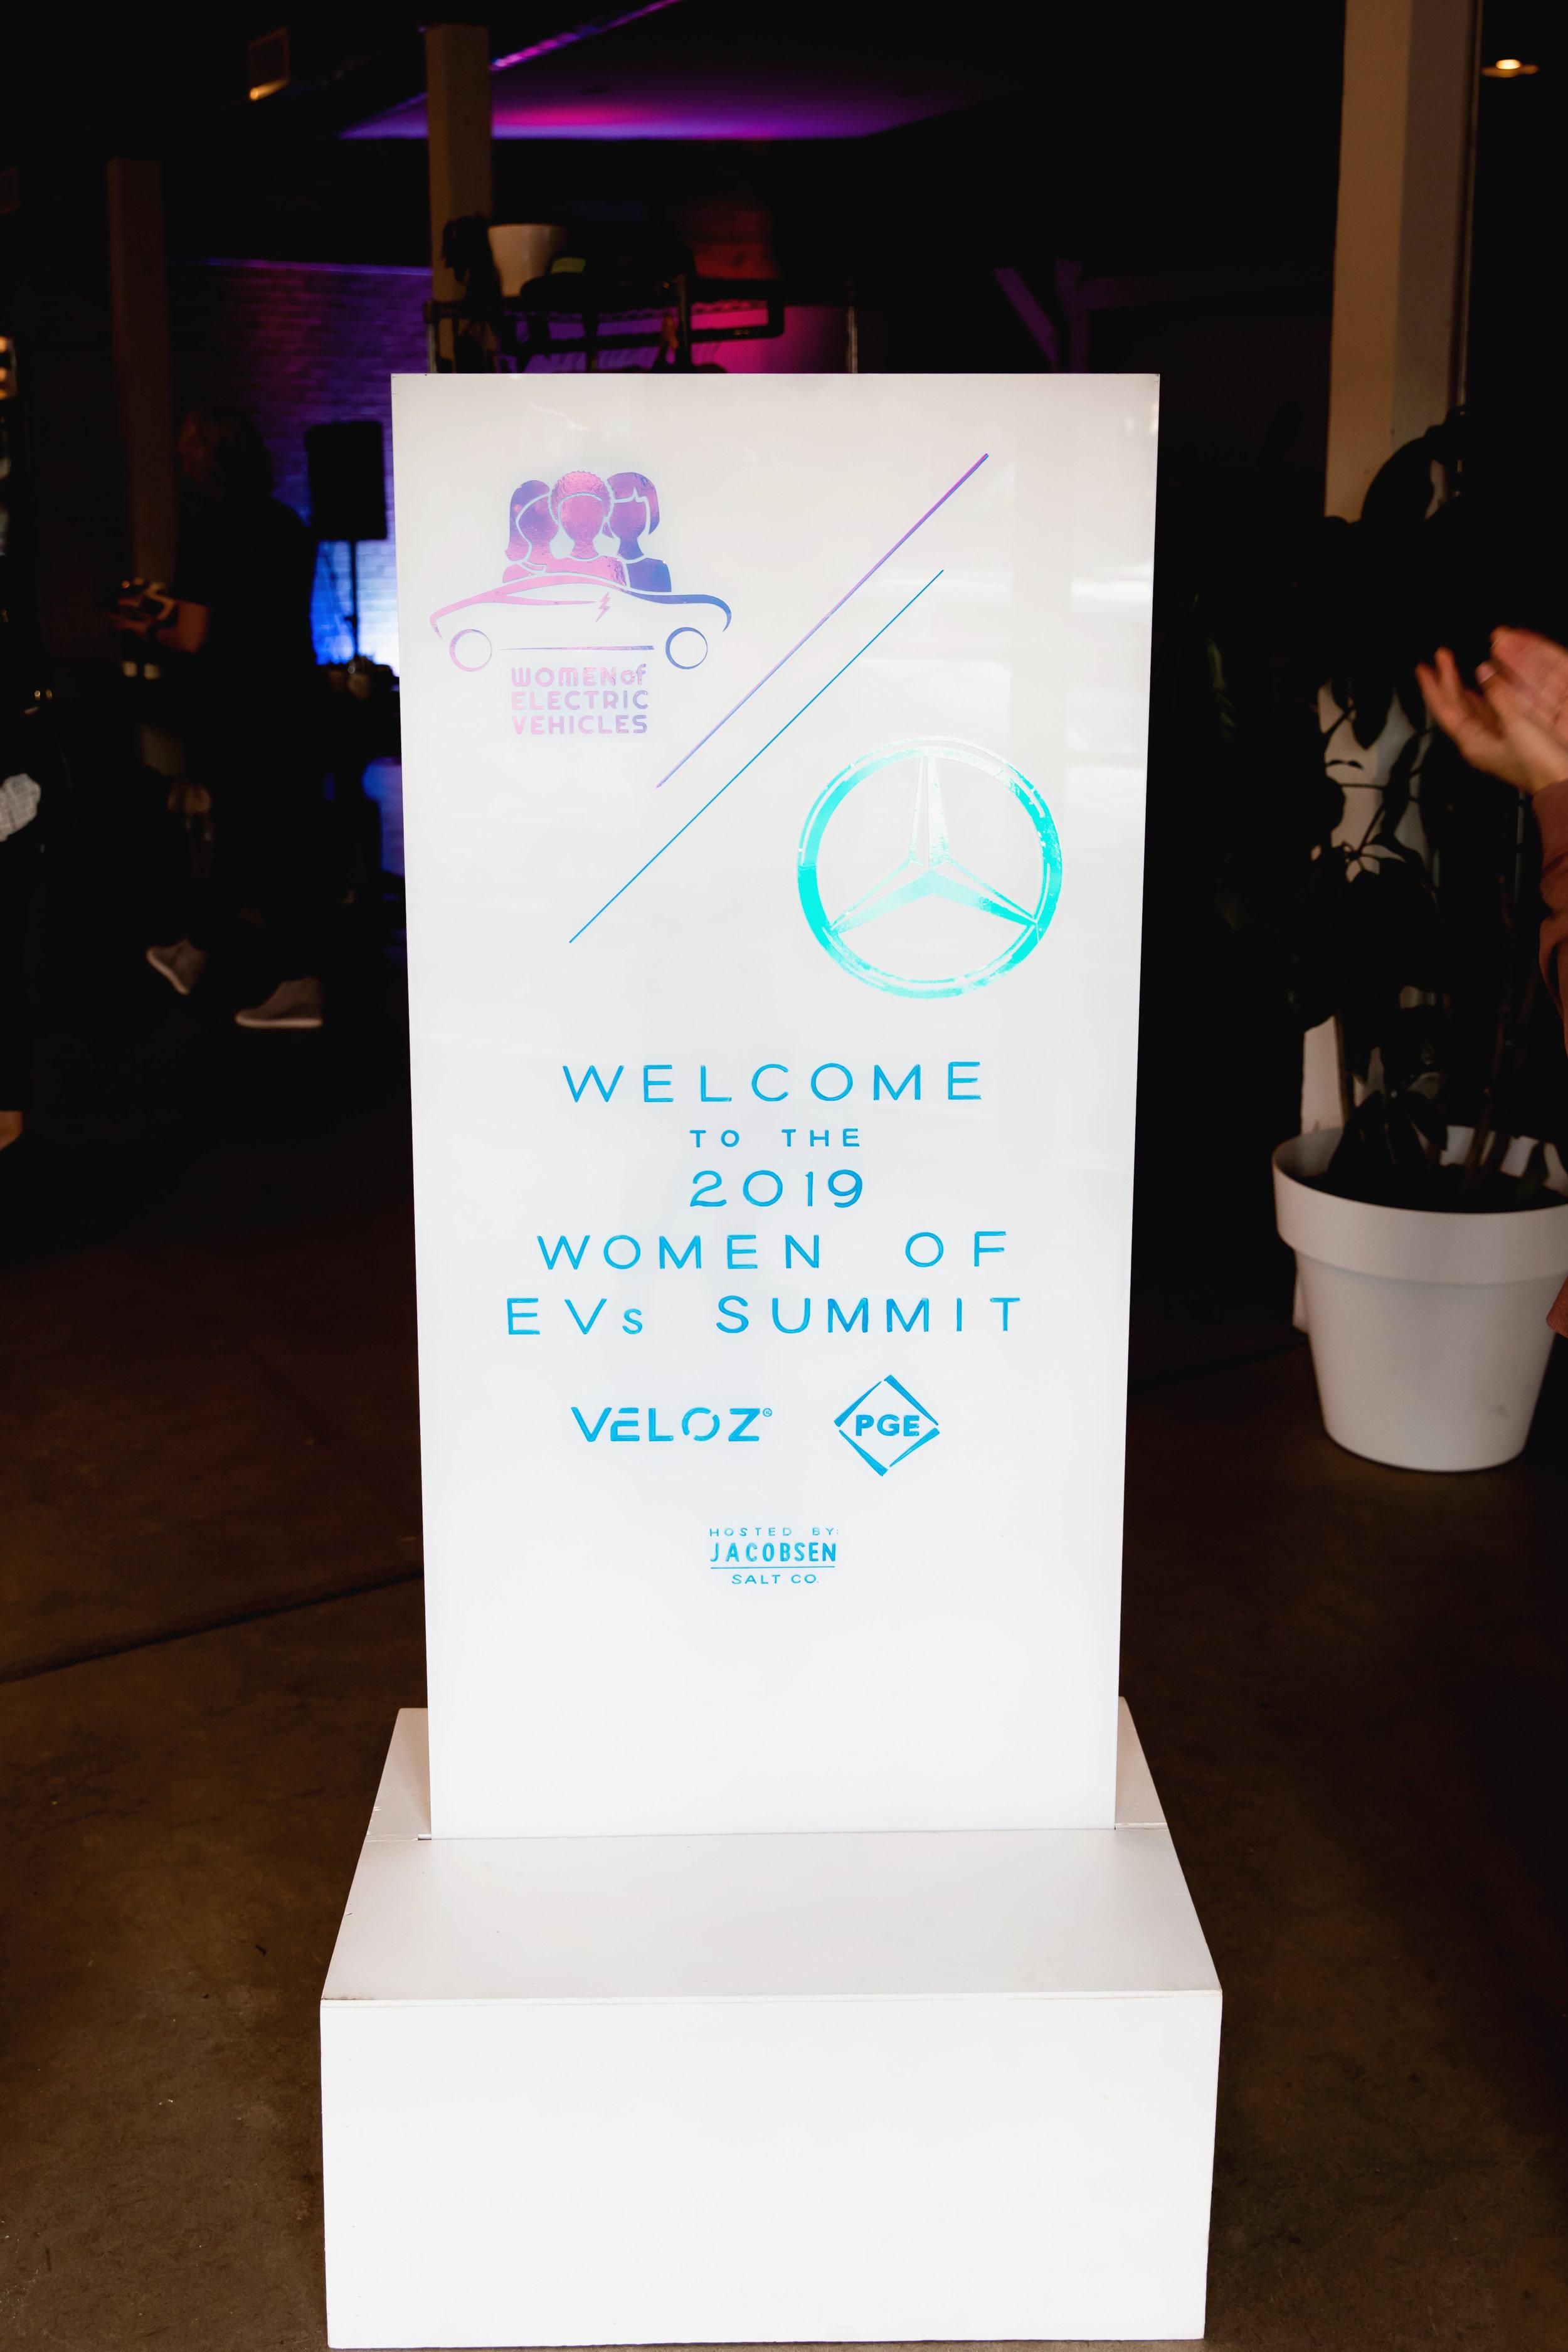 Women_of_EV_Annual_Summit_2019-8290.jpg